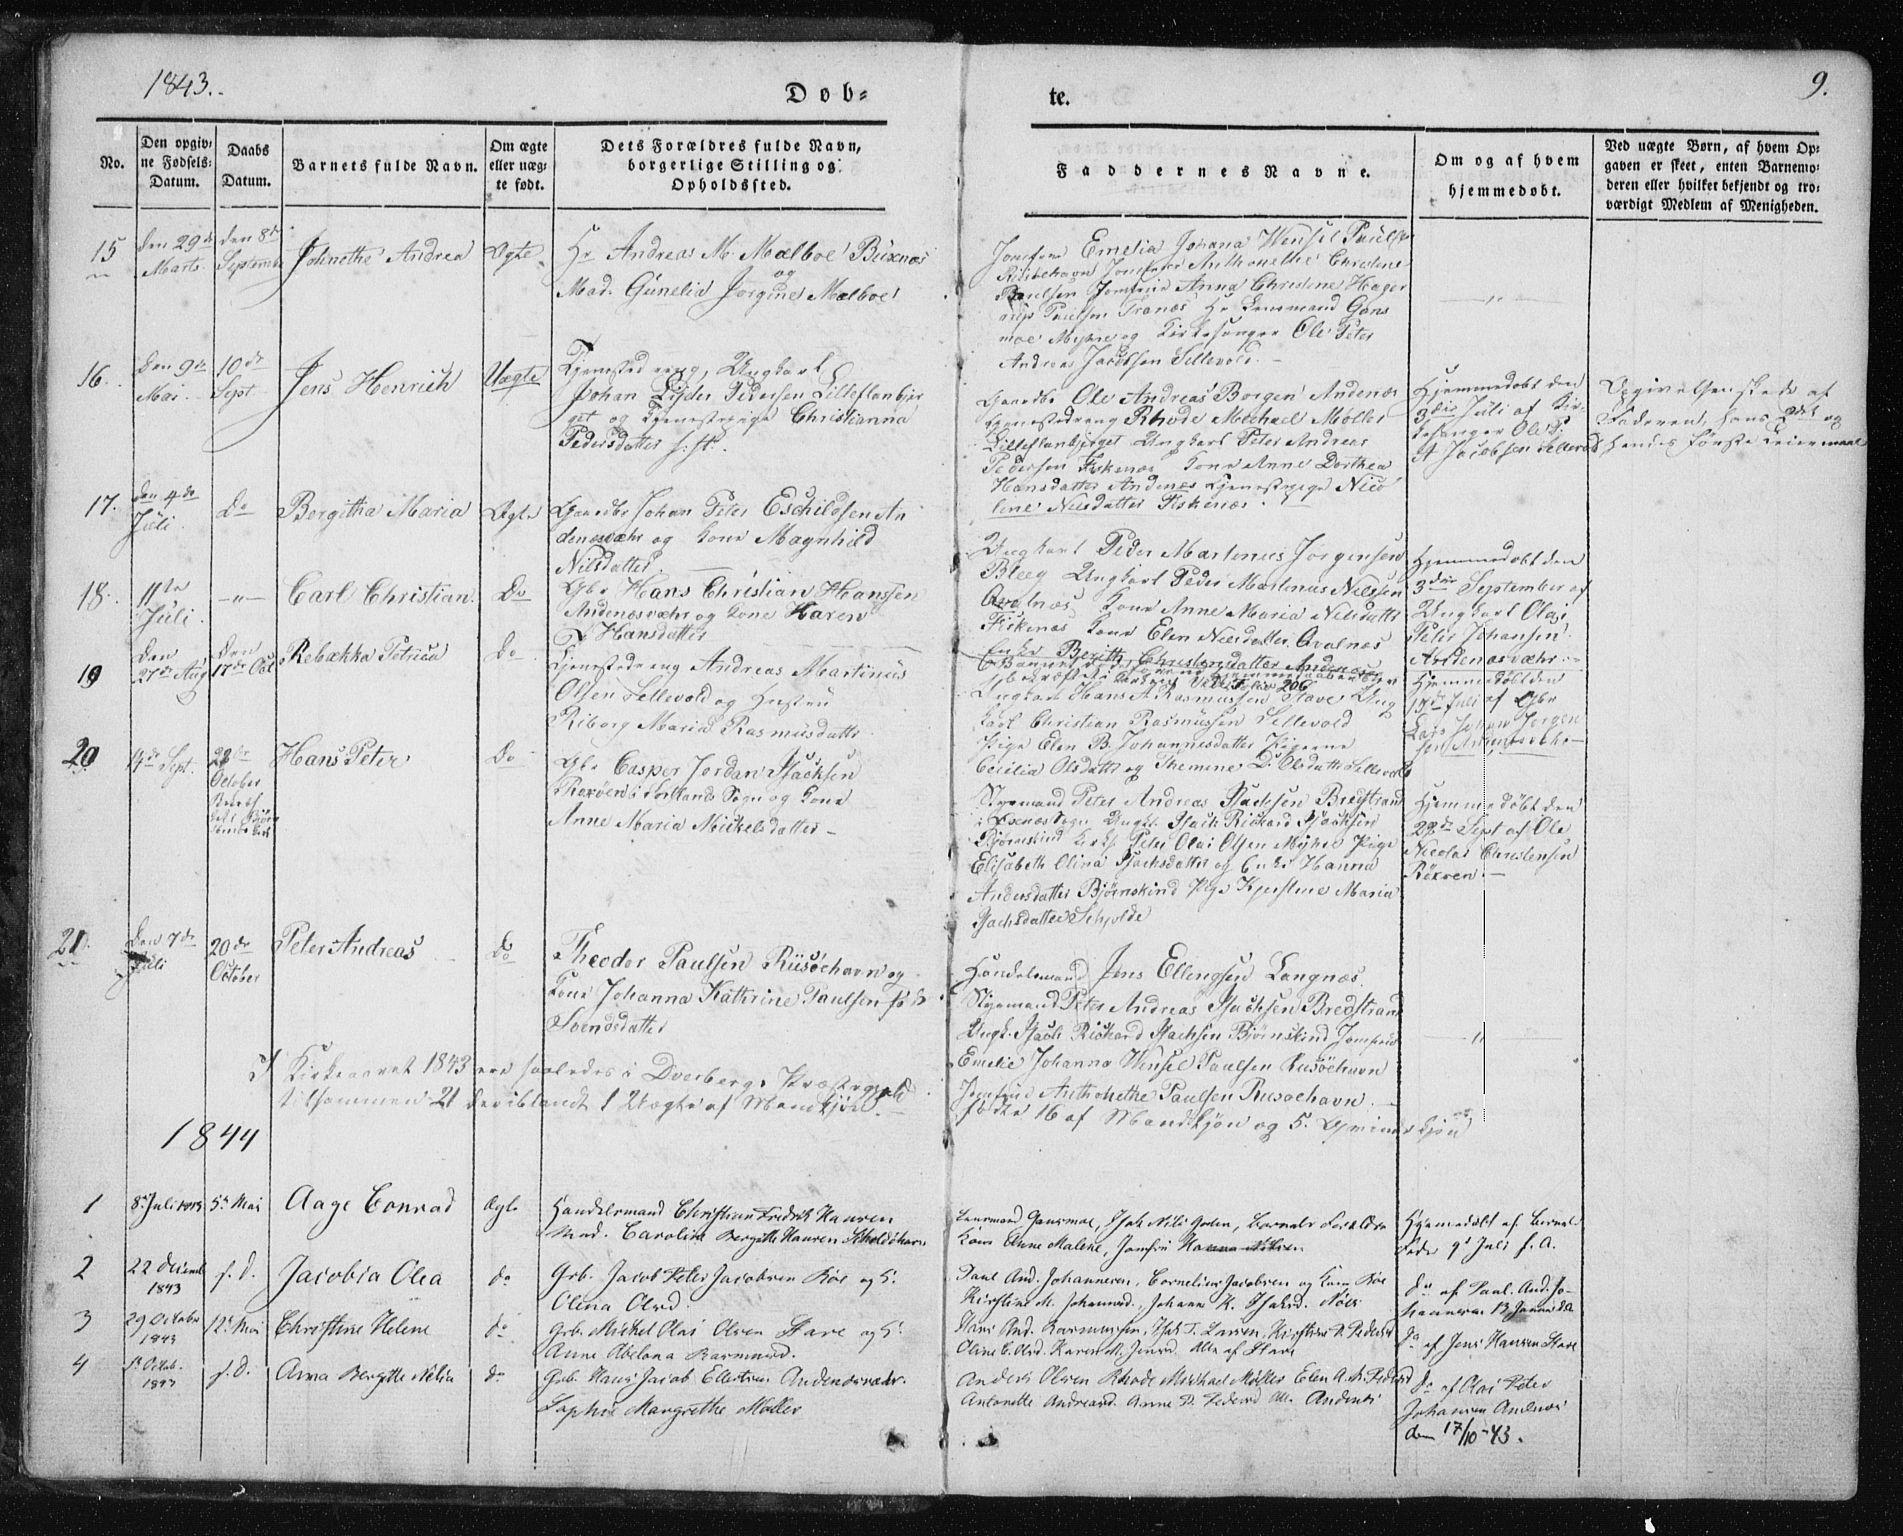 SAT, Ministerialprotokoller, klokkerbøker og fødselsregistre - Nordland, 897/L1396: Ministerialbok nr. 897A04, 1842-1866, s. 9